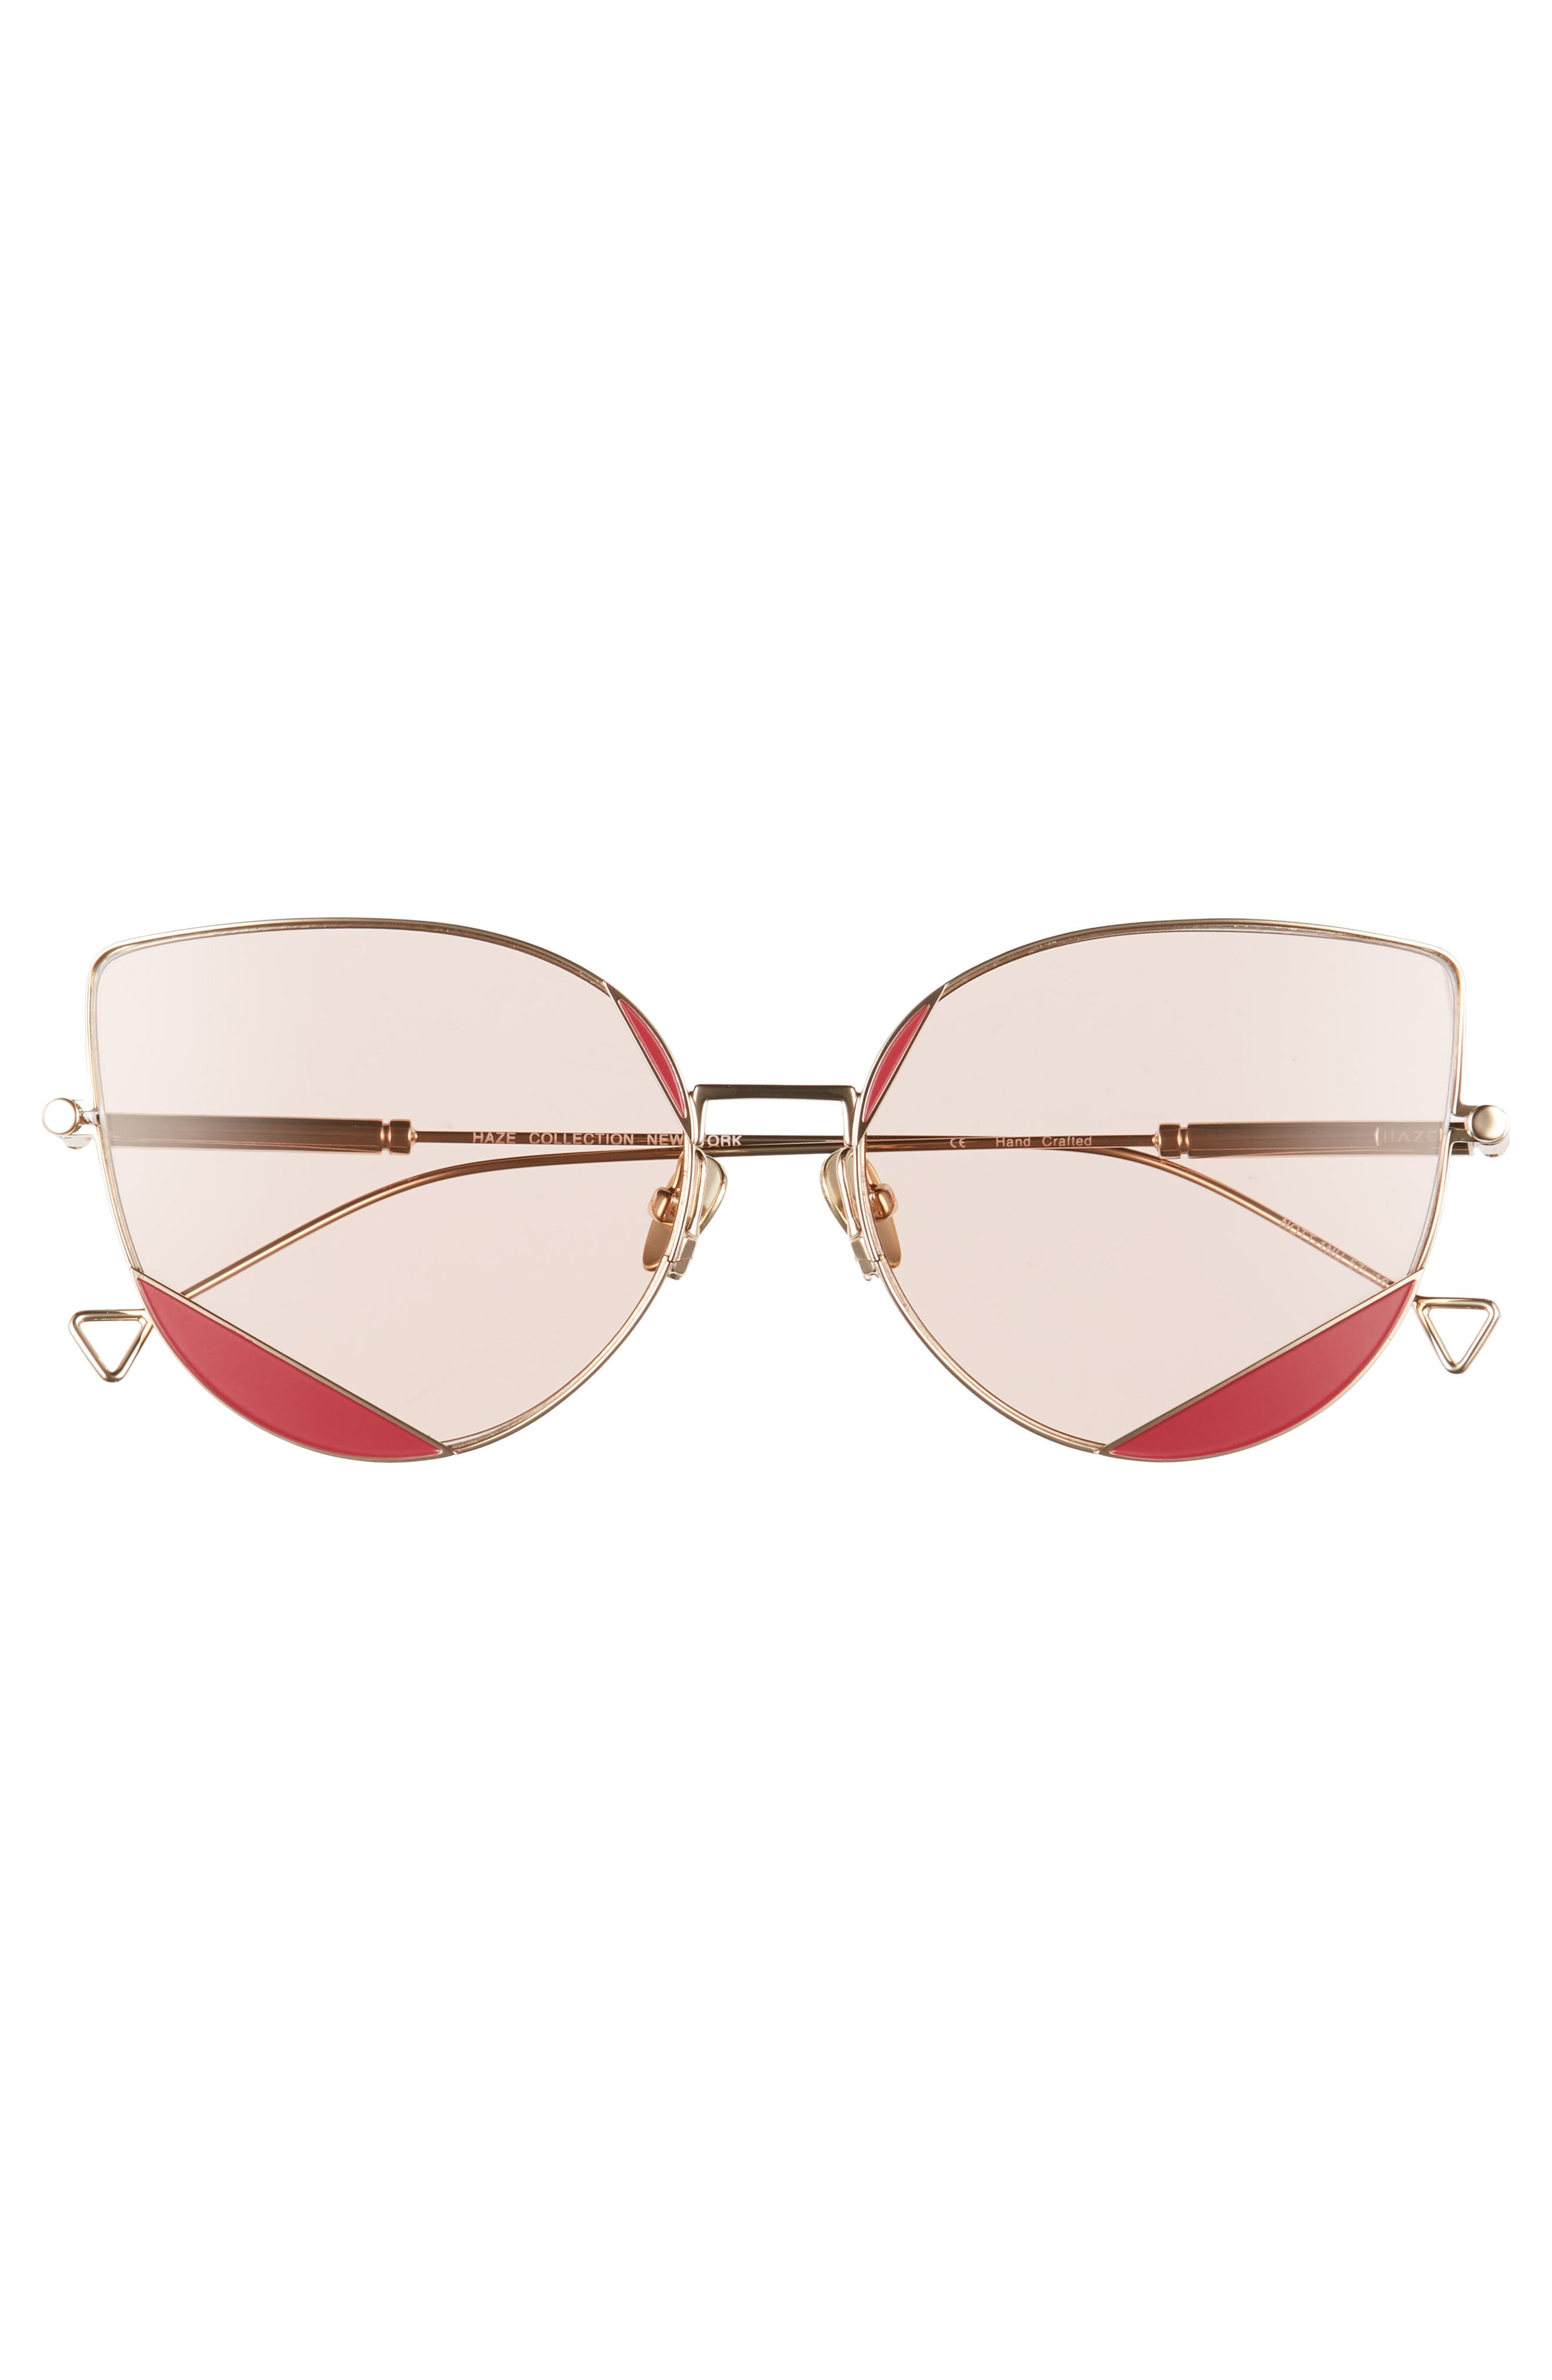 HAZE,                             The Nott 57mm Sunglasses,                             Alternate thumbnail 3, color,                             DEEP CLARET